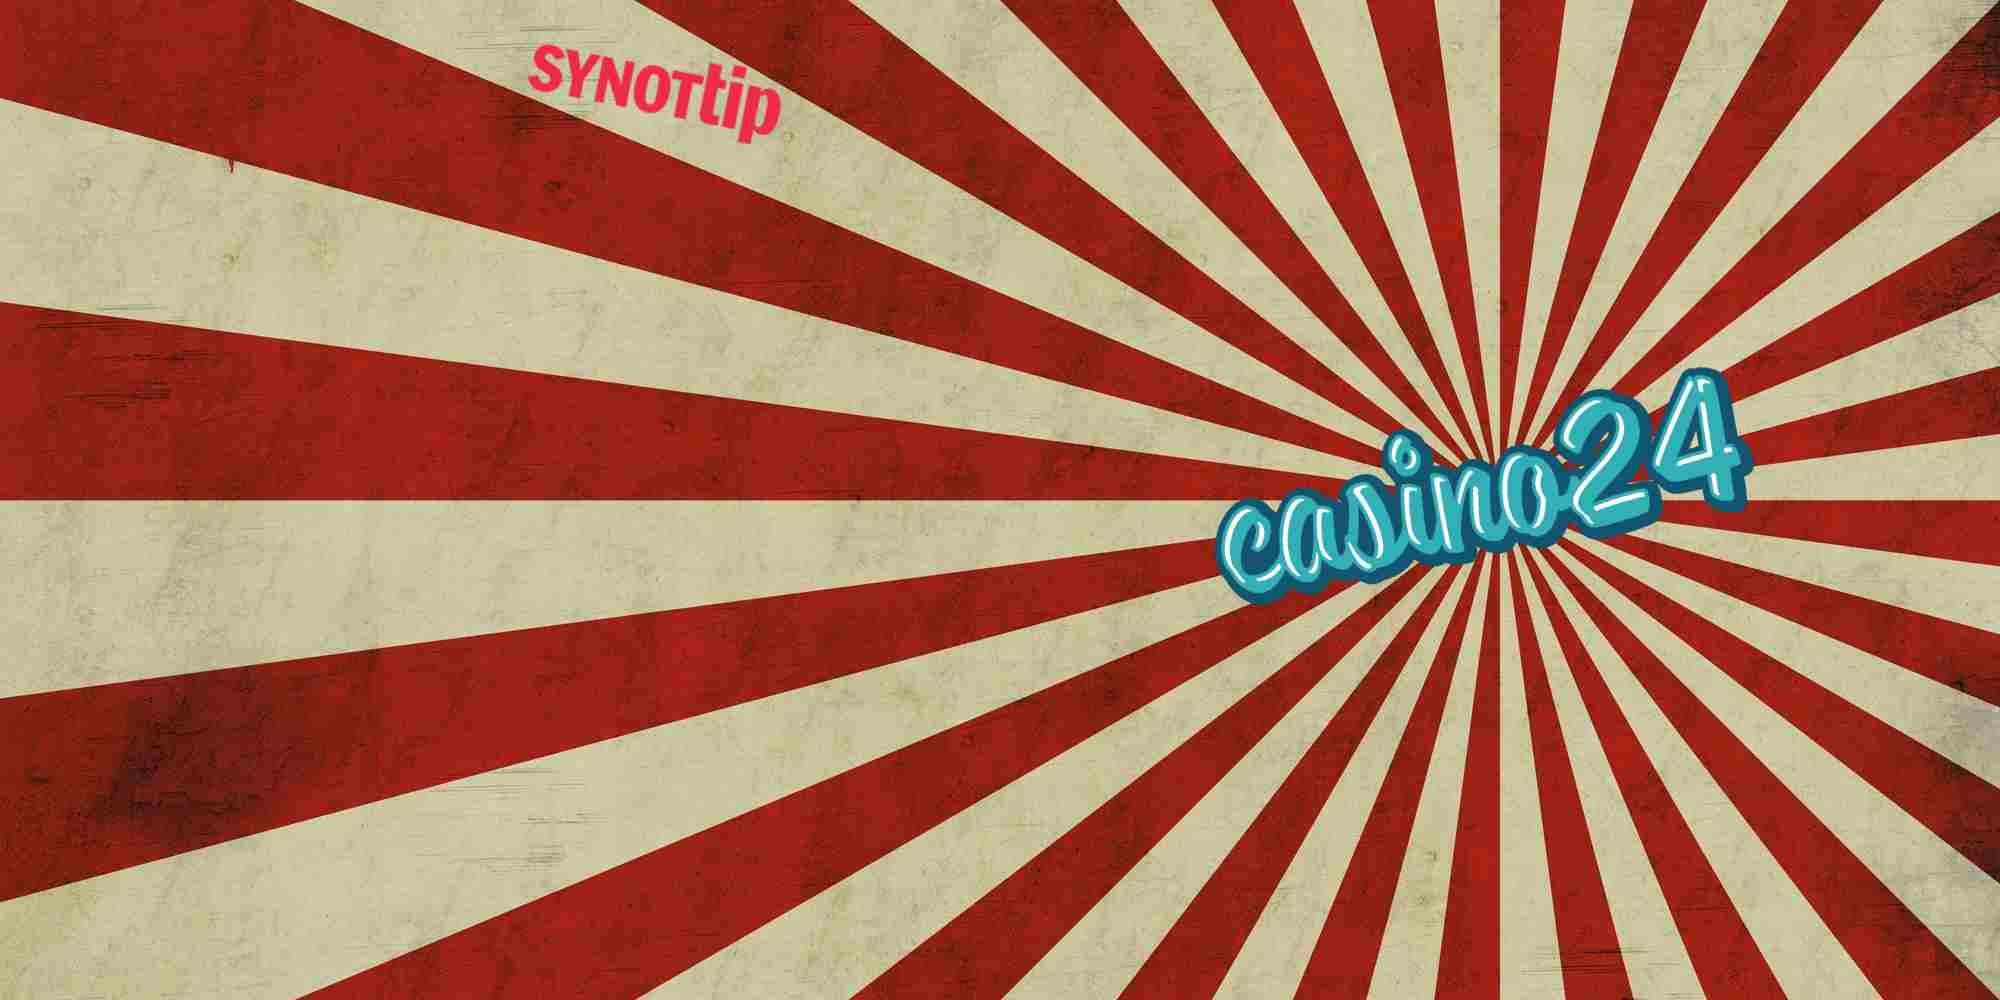 Synottip kazino bonuss